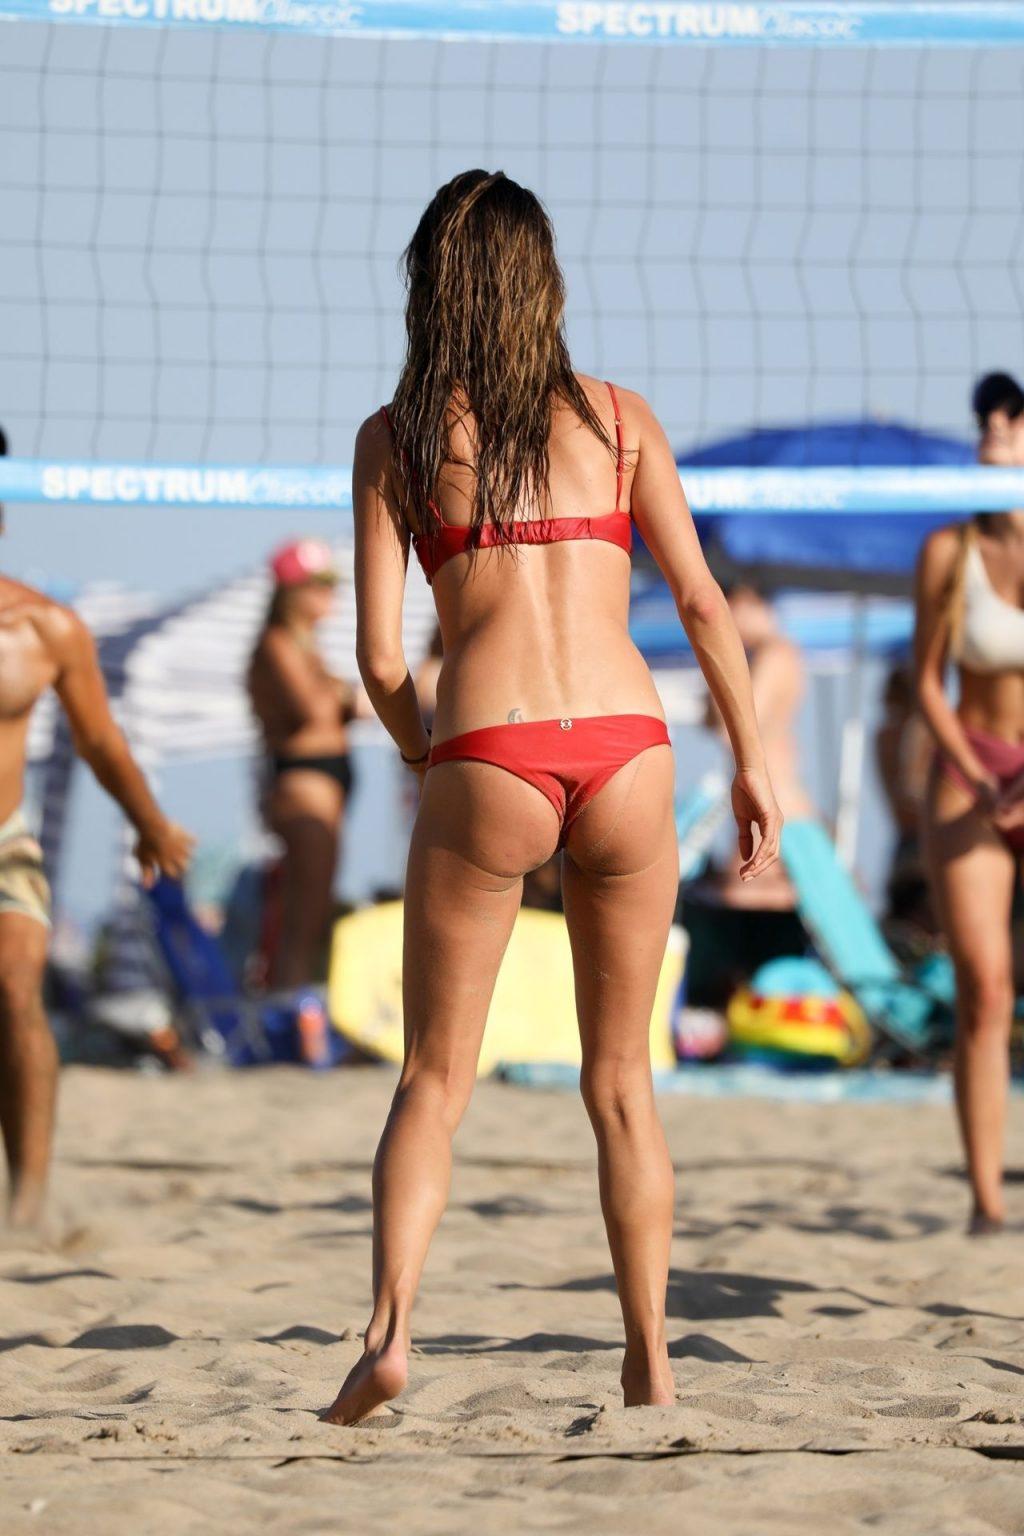 Alessandra Ambrosio Turns Heads in a Red Bikini on the Beach (169 Photos)